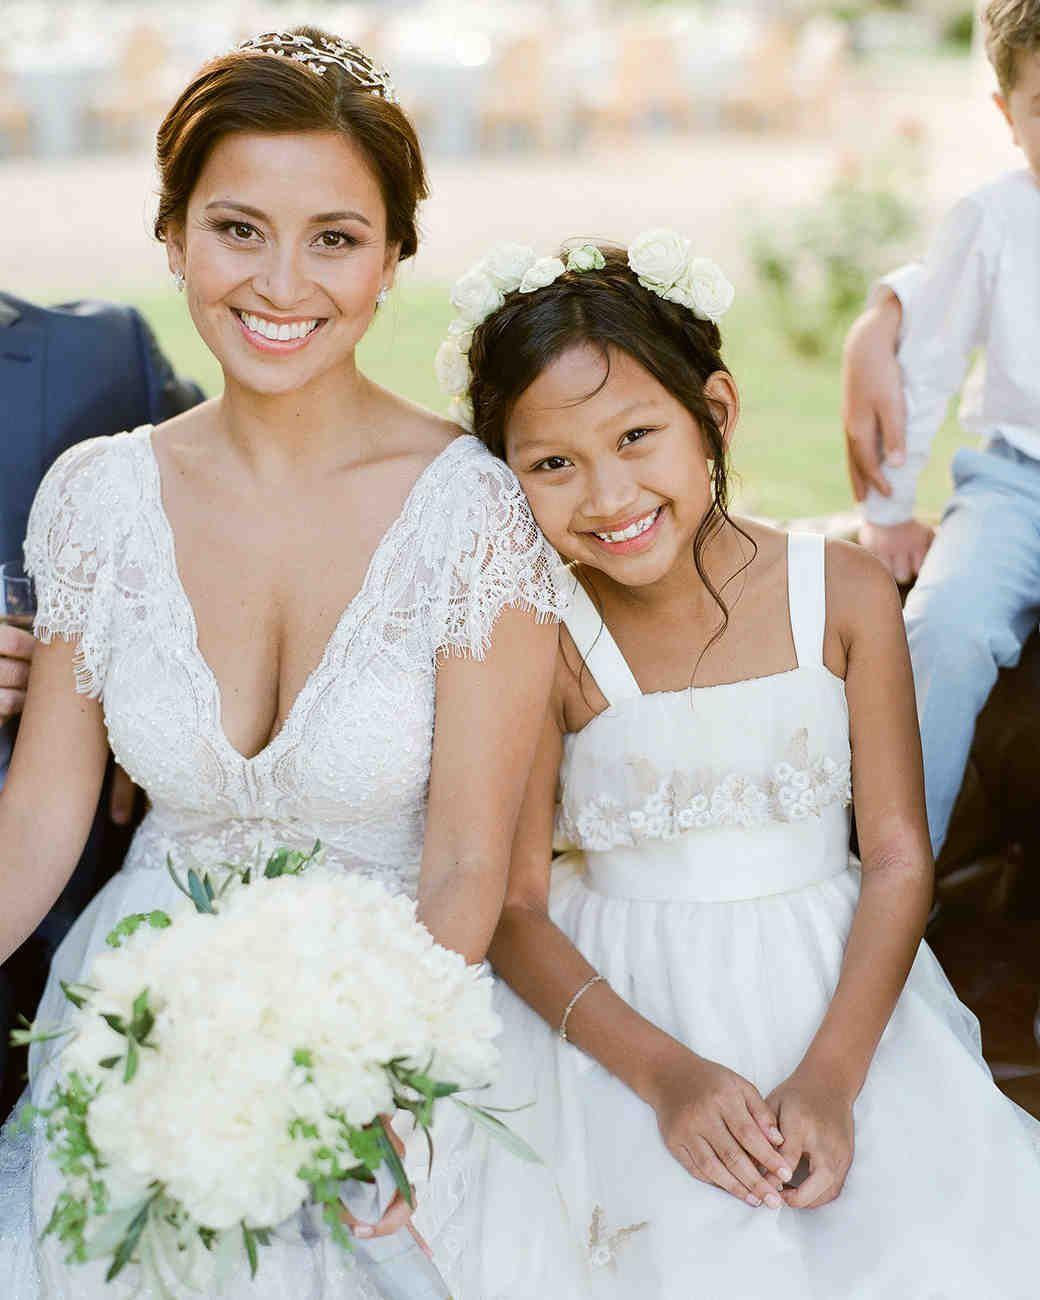 Martha Stewart Daughter Wedding.A Chic Family Oriented Destination Wedding In France